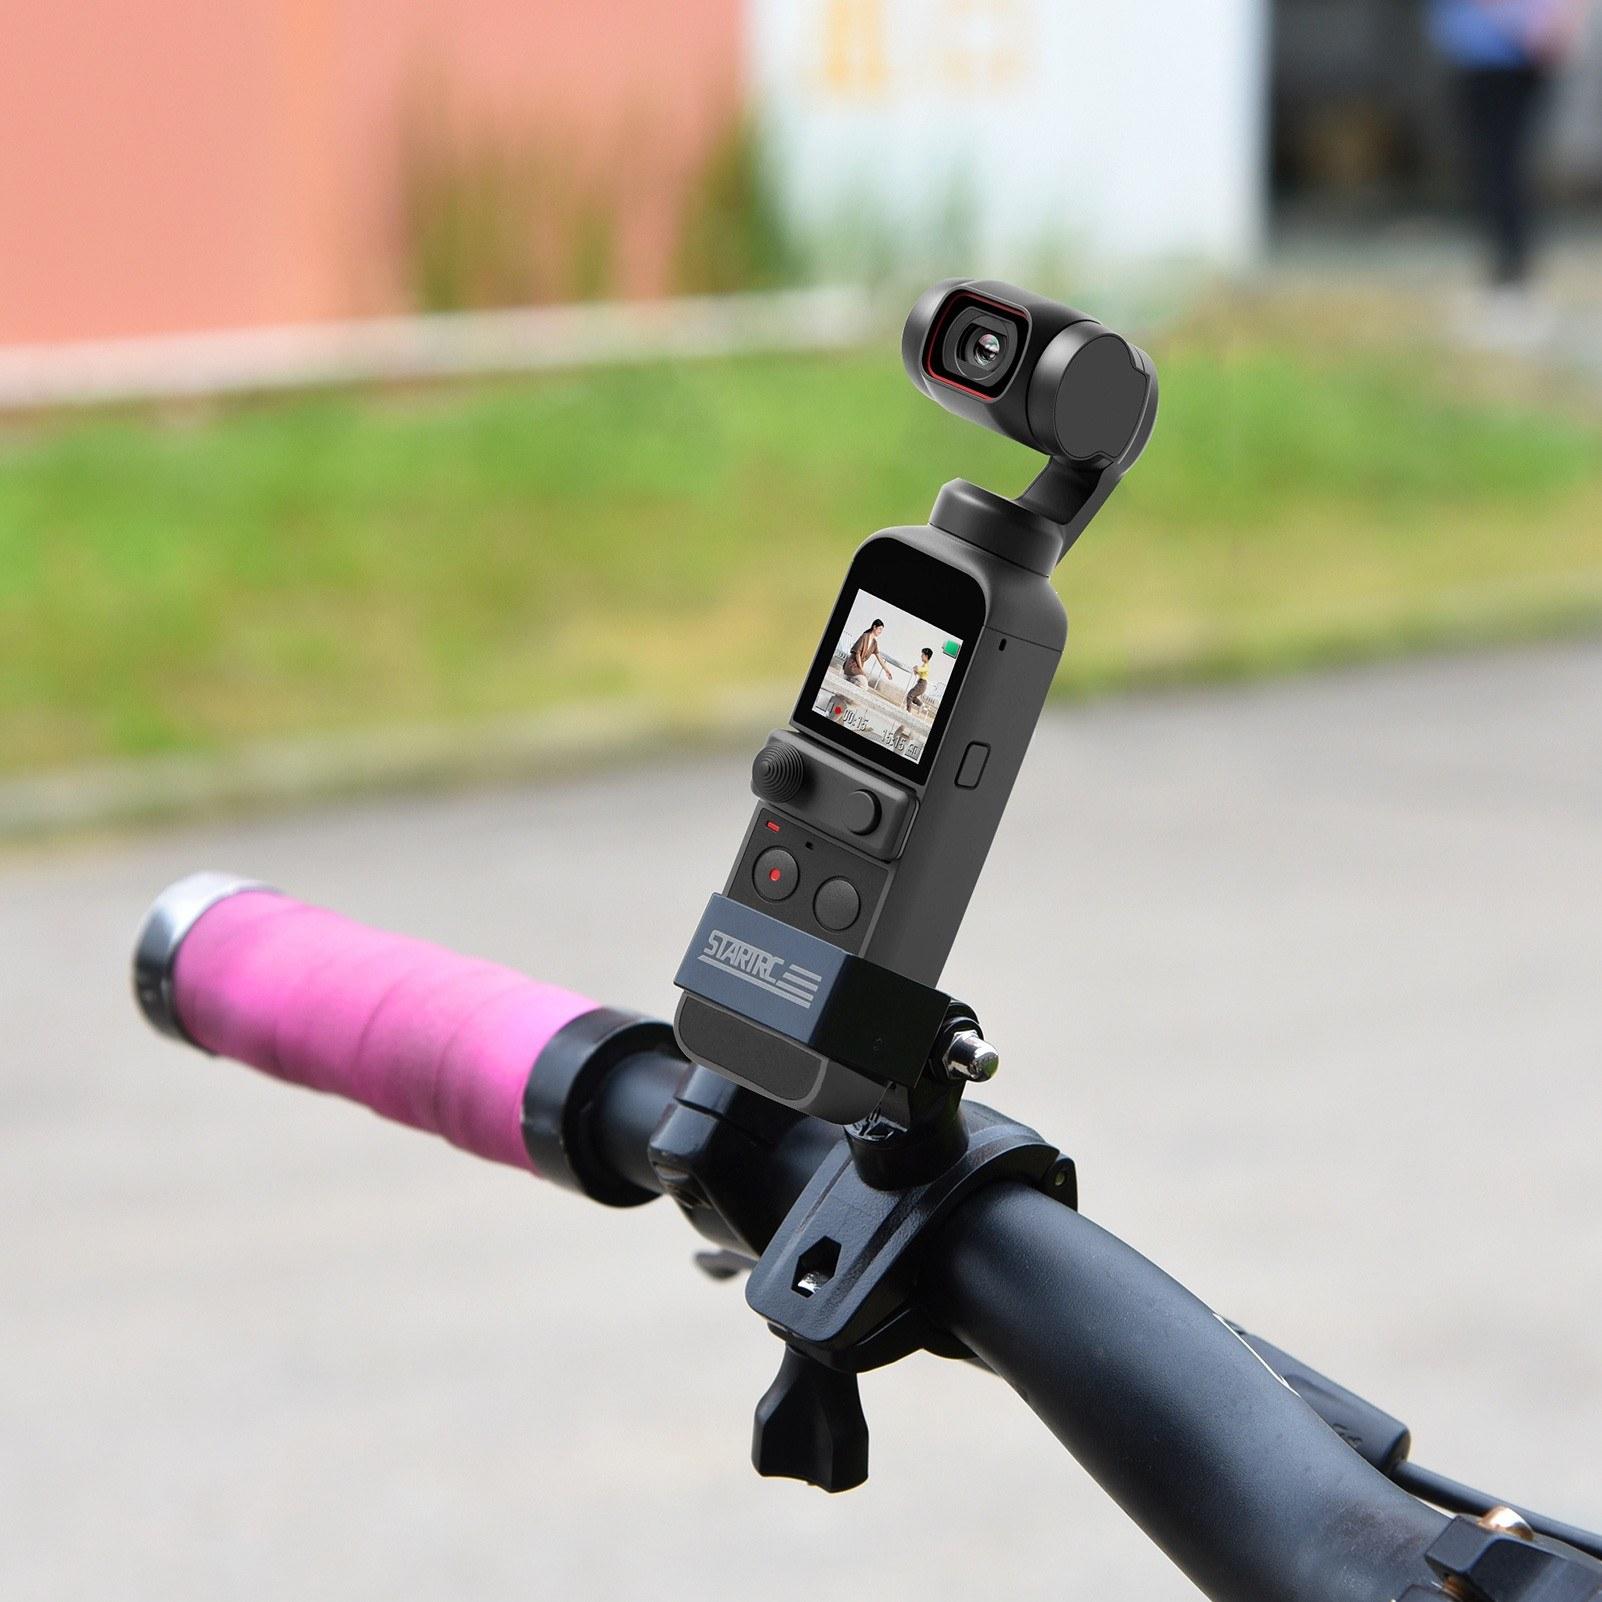 bicycle handlebar mount kit compatible with dji osmo pocket 2 pocket